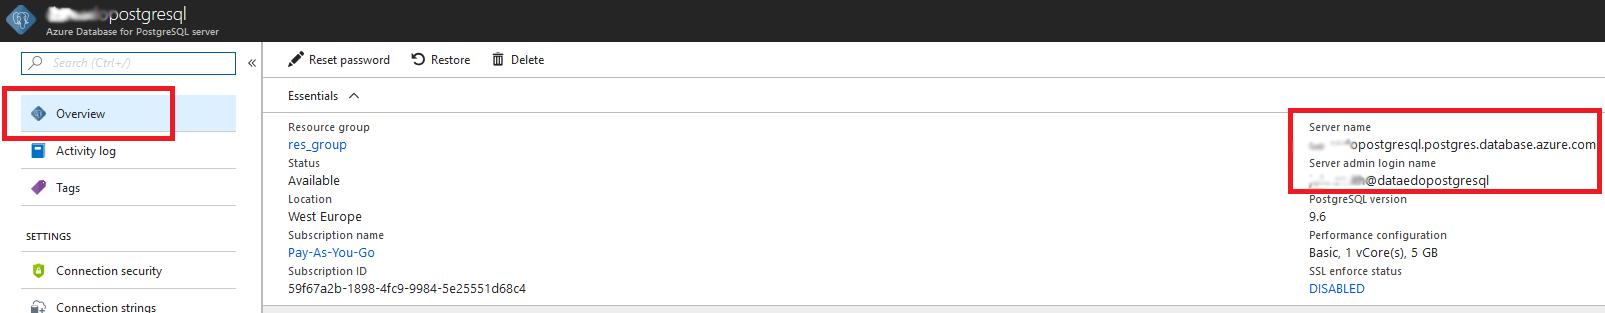 Connection to Azure Database for PostgreSQL